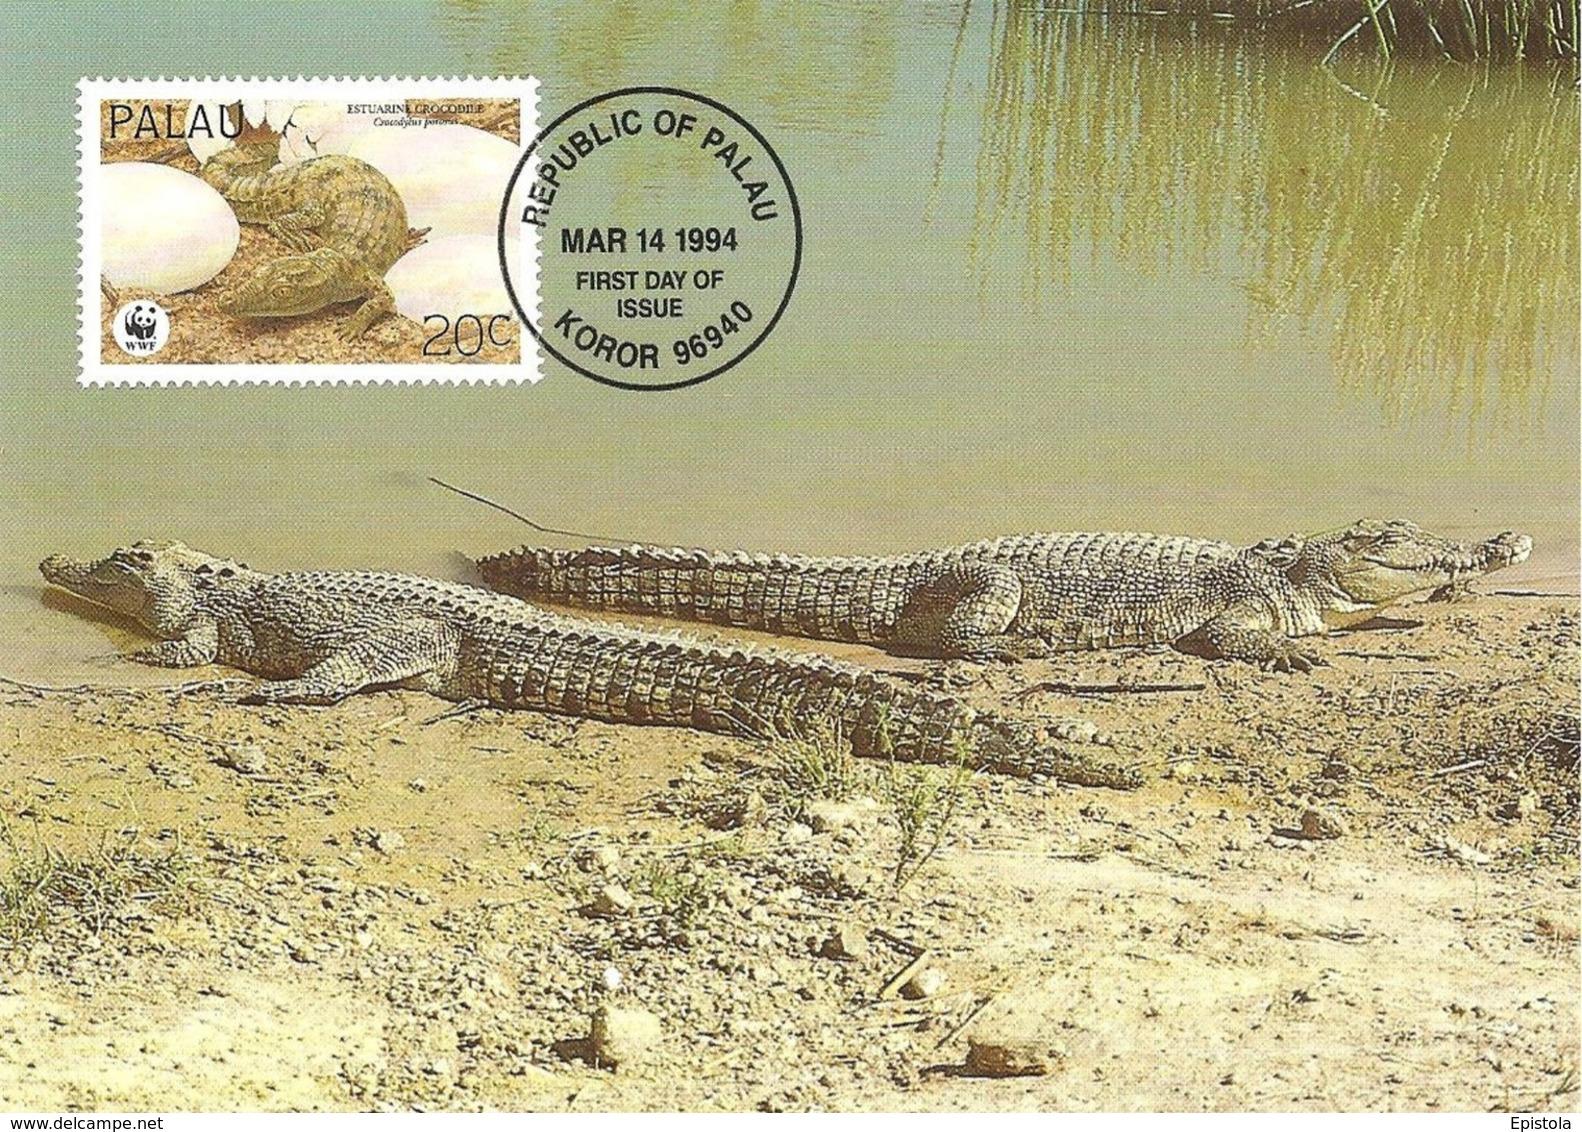 1994 - PALAU - Koror - Estuarine Crocodile - Crocodile à Double Crête WWF - Palau